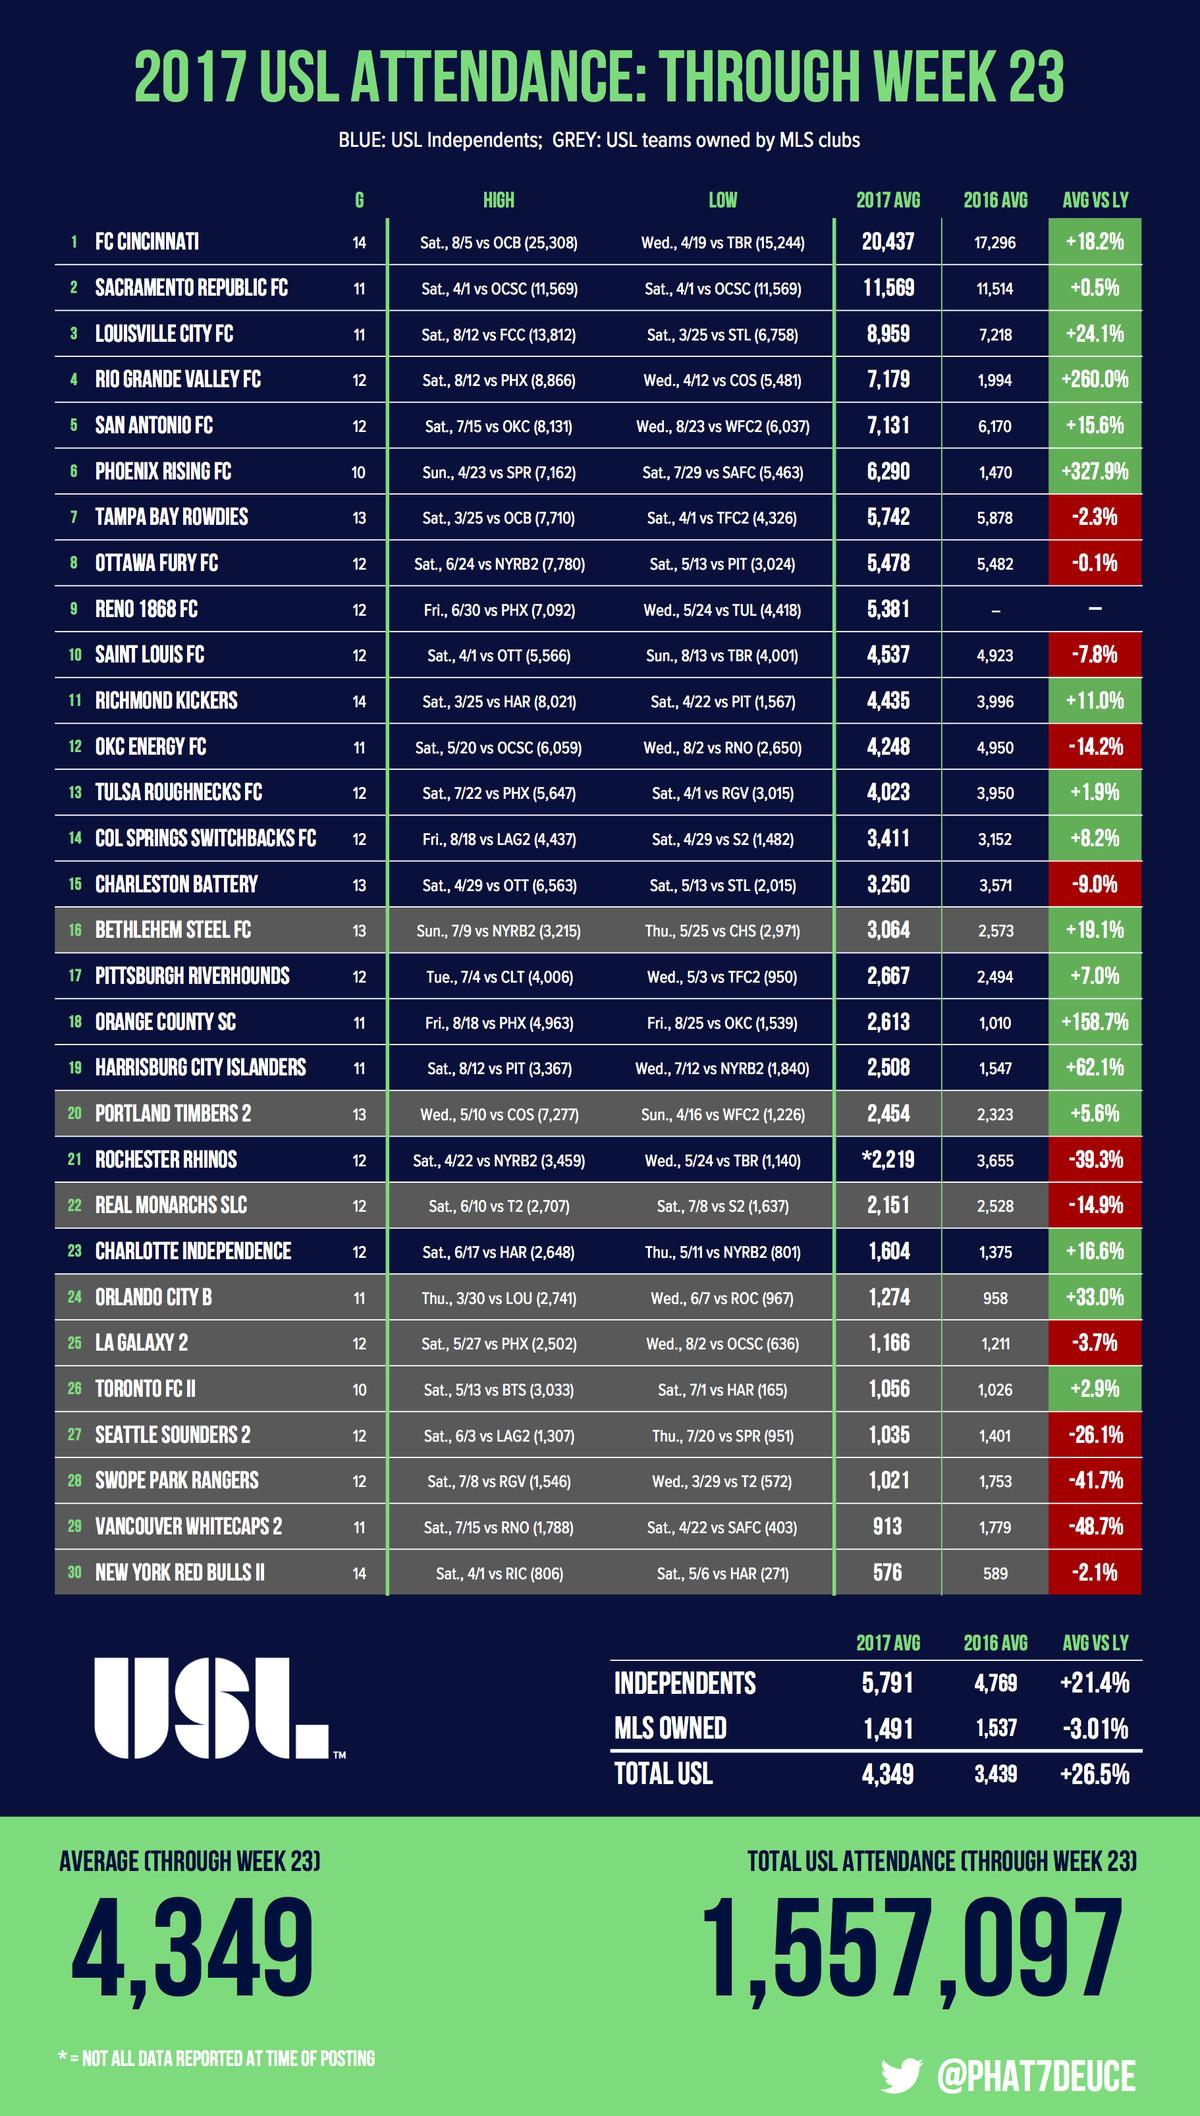 Total USL Attendance through Week 23